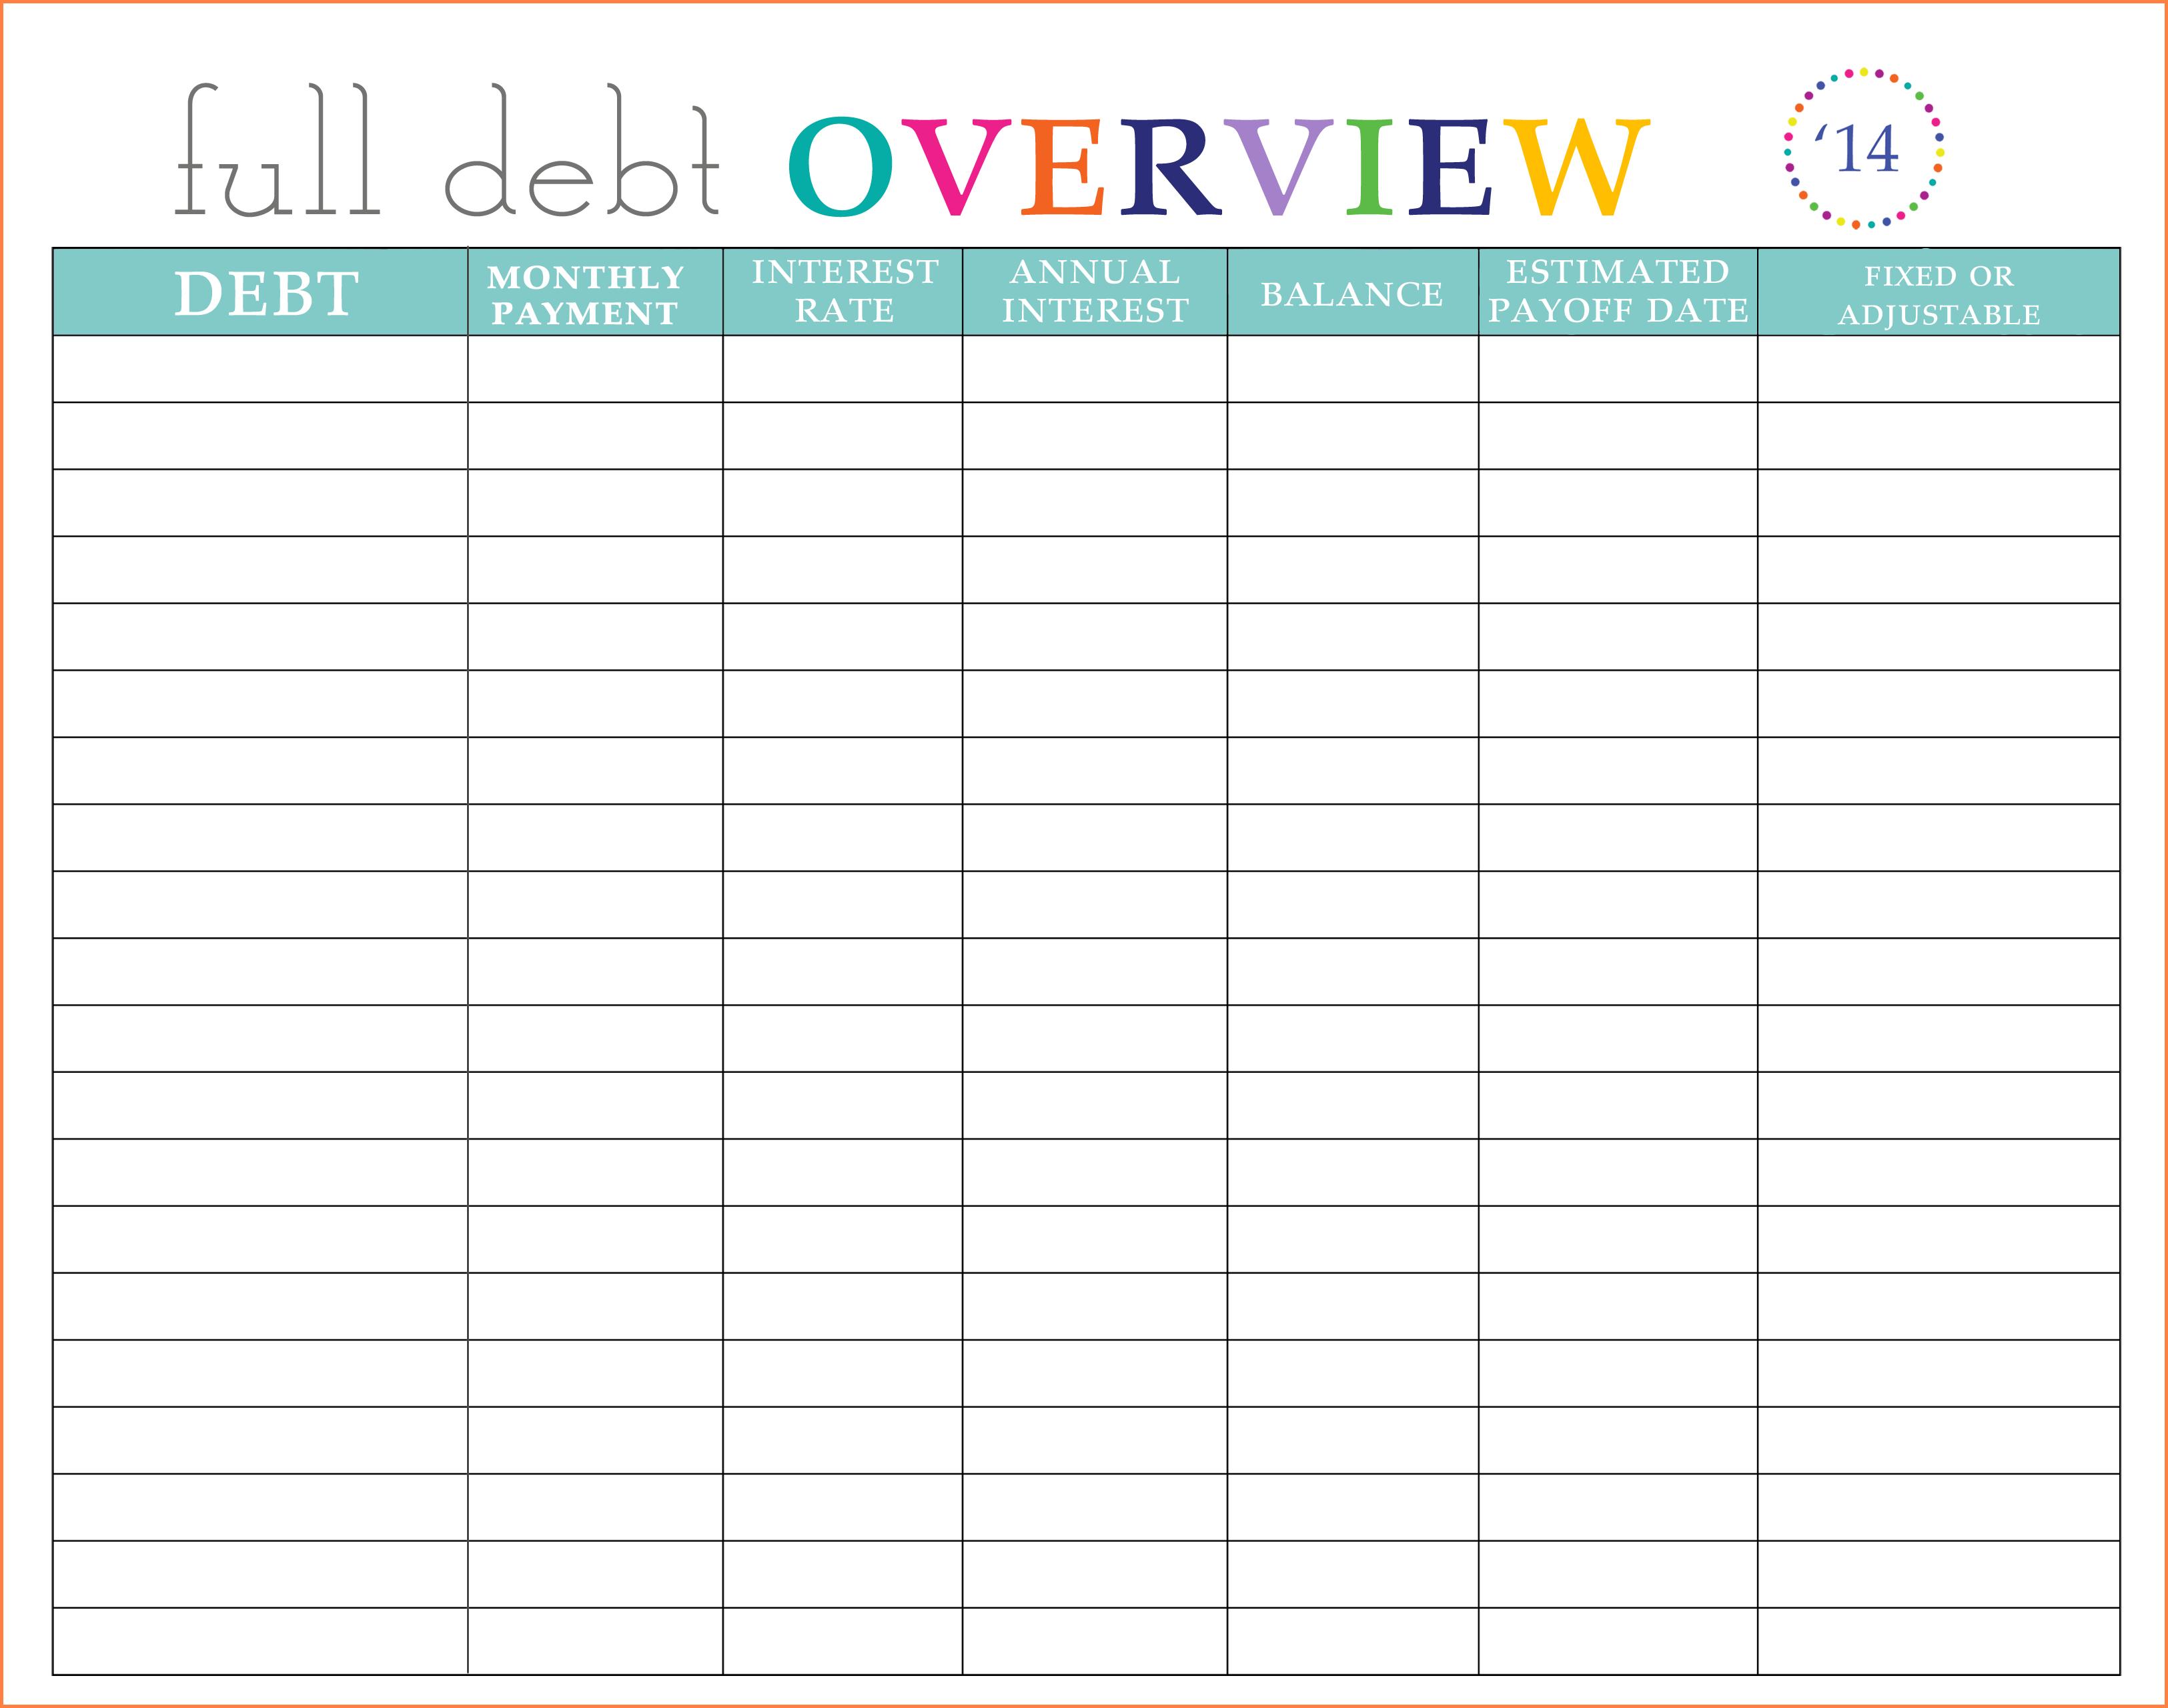 Debt Paydown Spreadsheet Regarding Debt Spreadsheet Lovevotingrg Paydown Payoff Snowball Vertex Mac